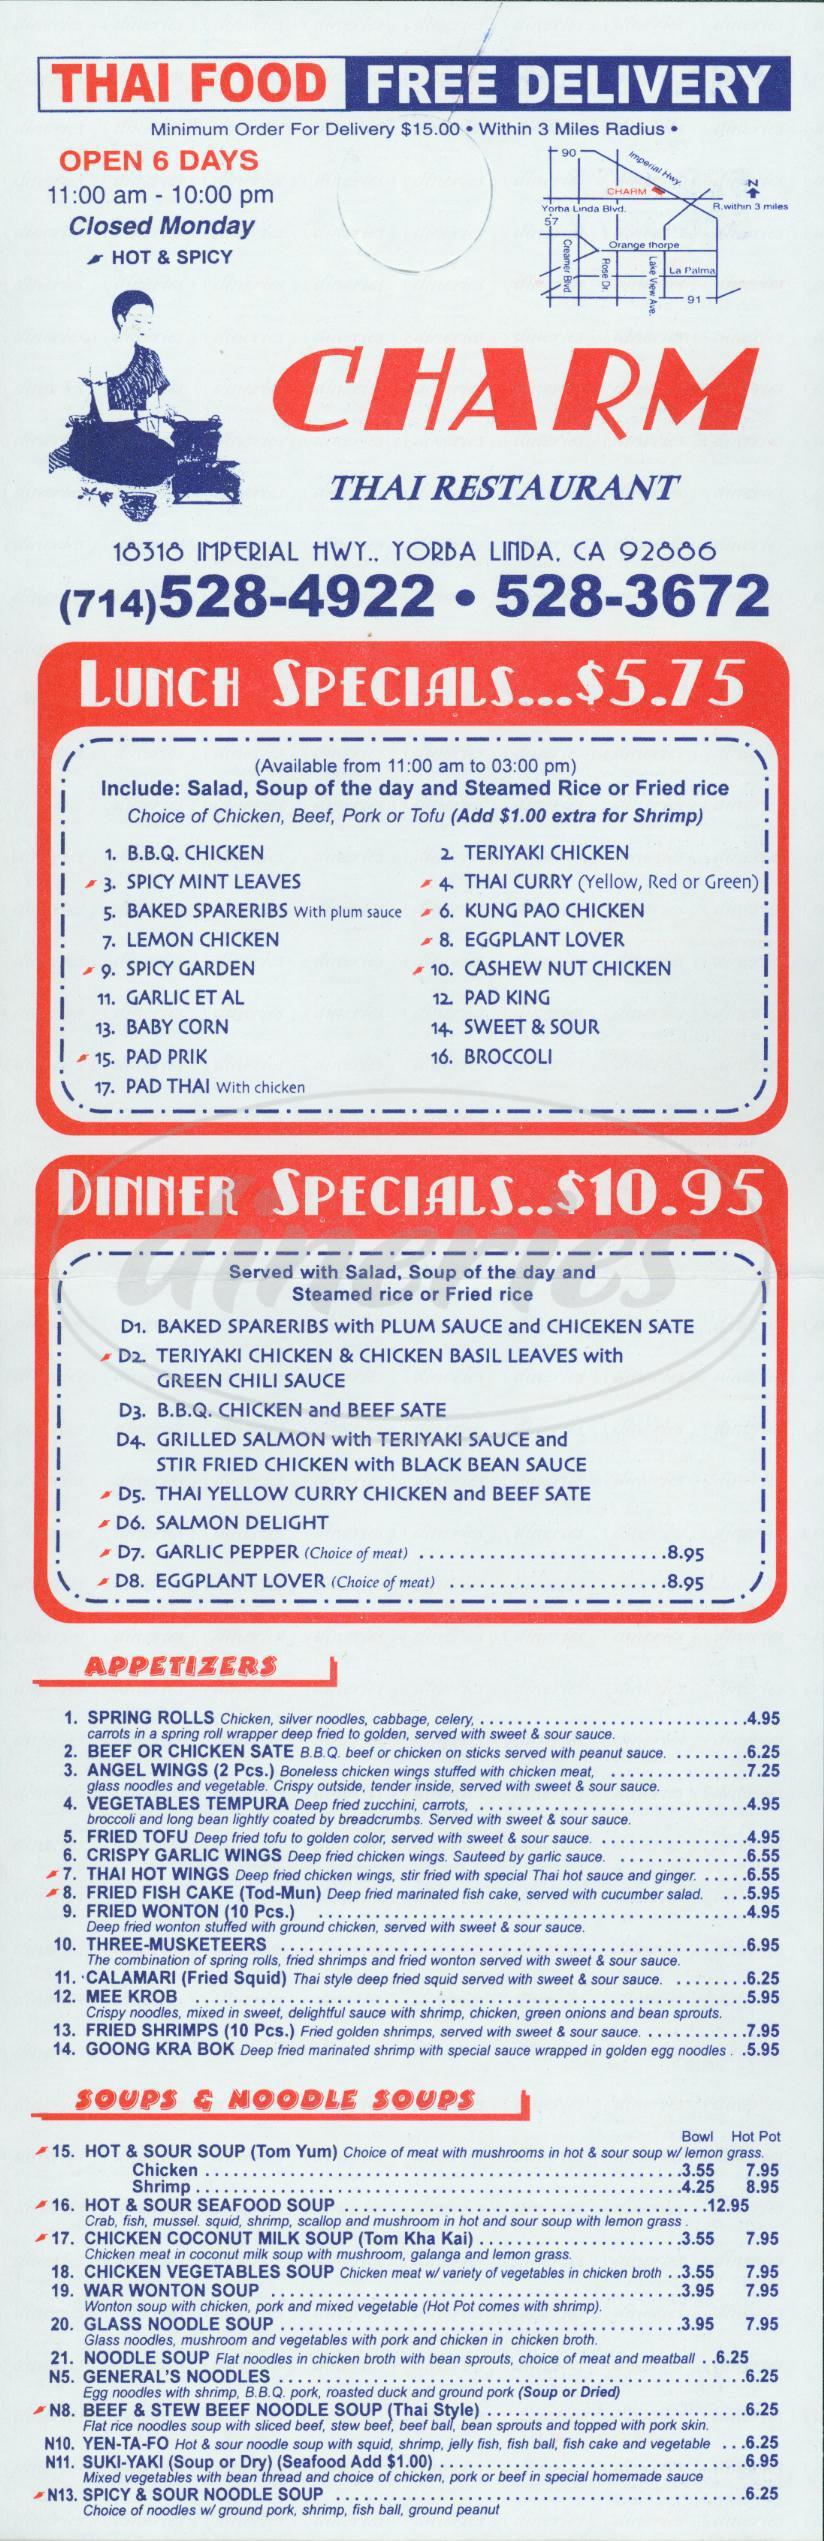 menu for Charm Thai Restaurant